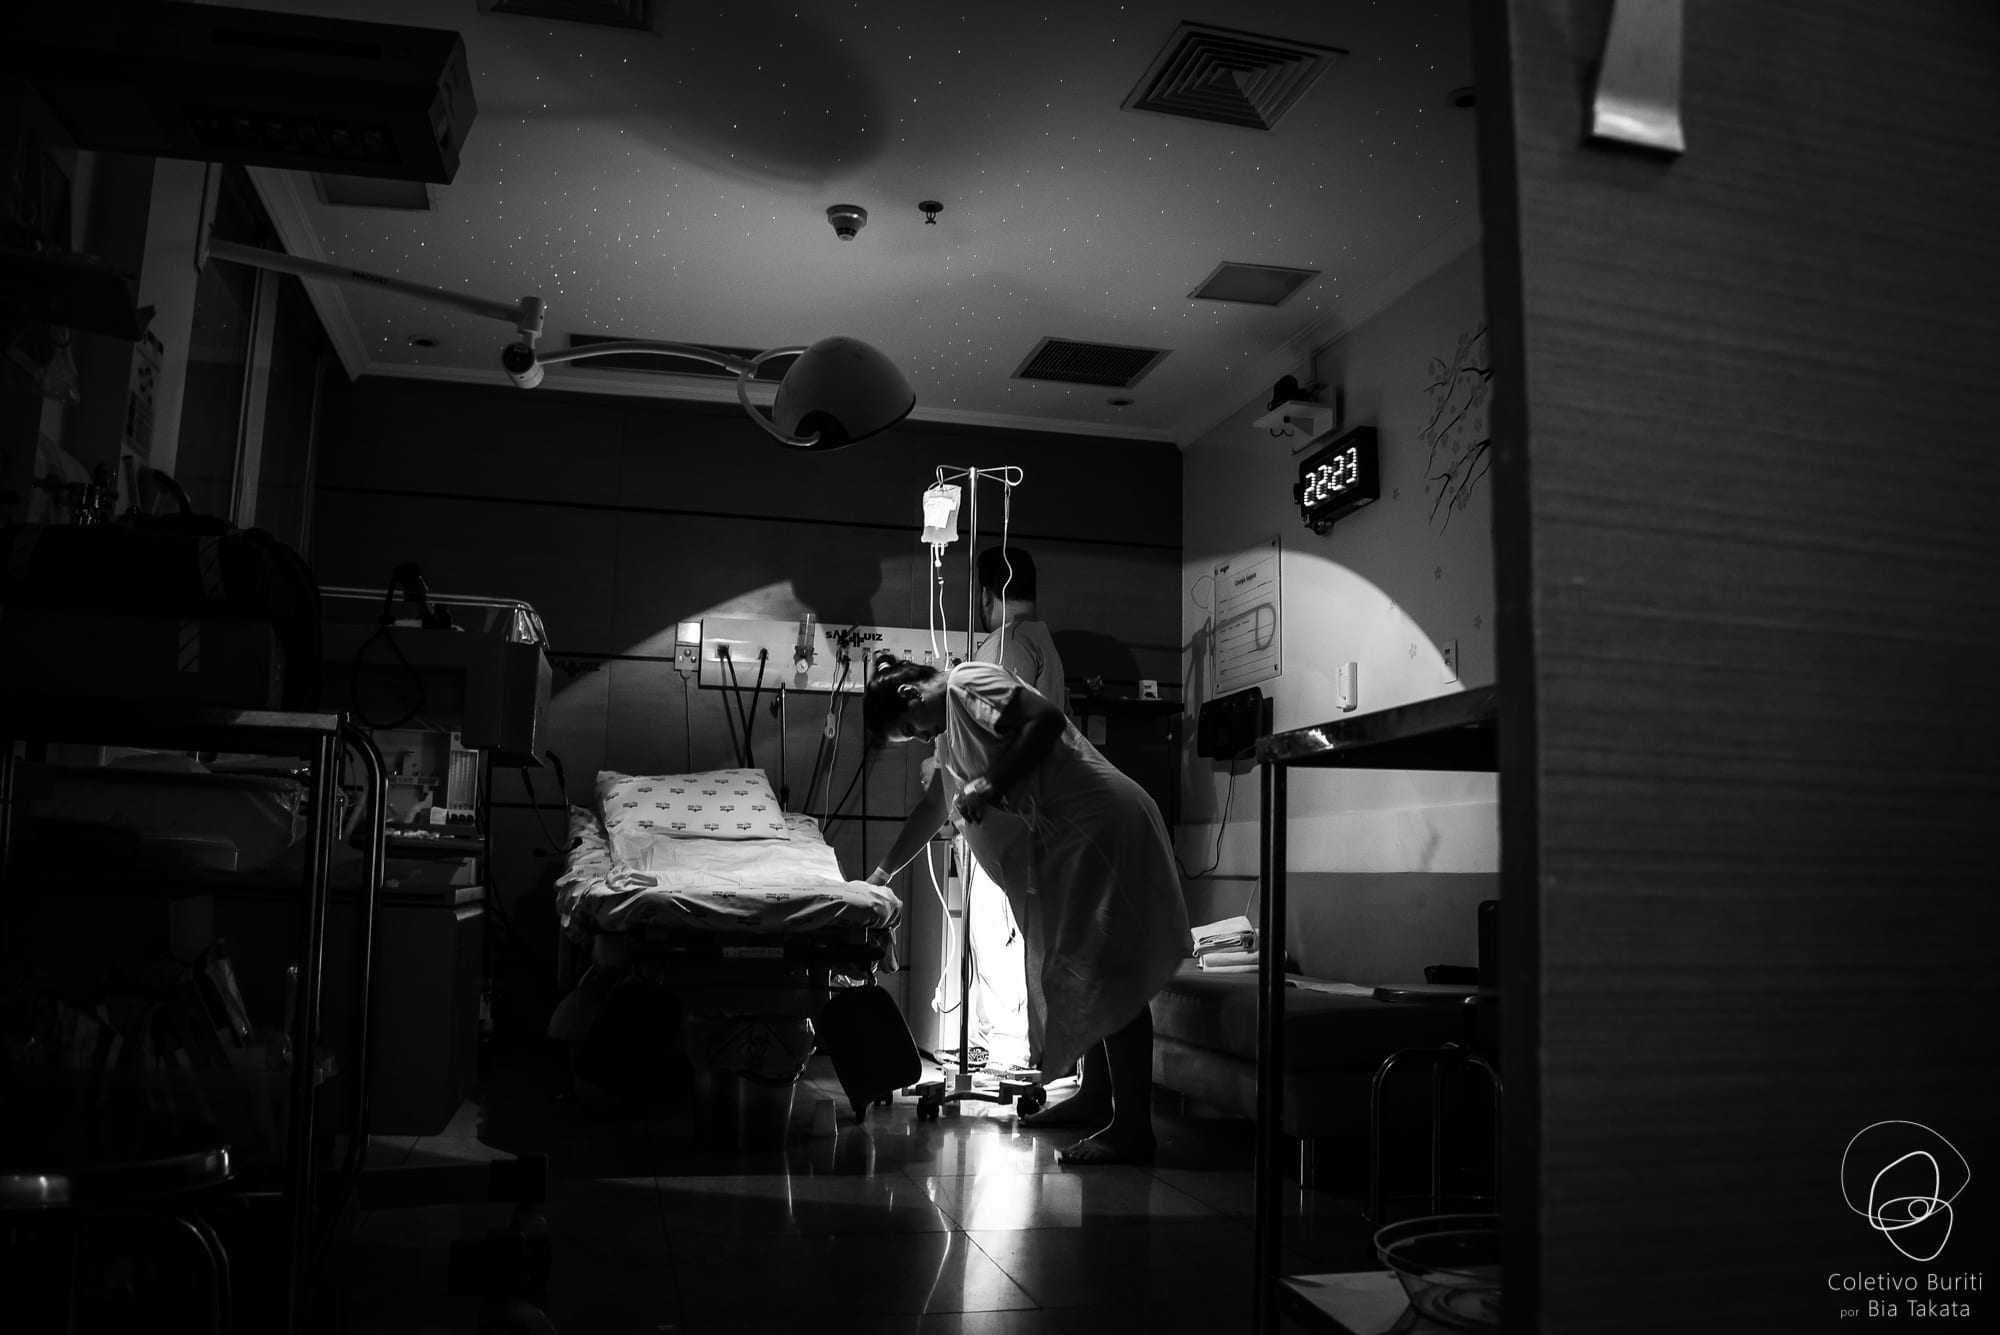 Mulher durante trabalho de parto (Foto: Coletivo Buriti por Bia Takata)